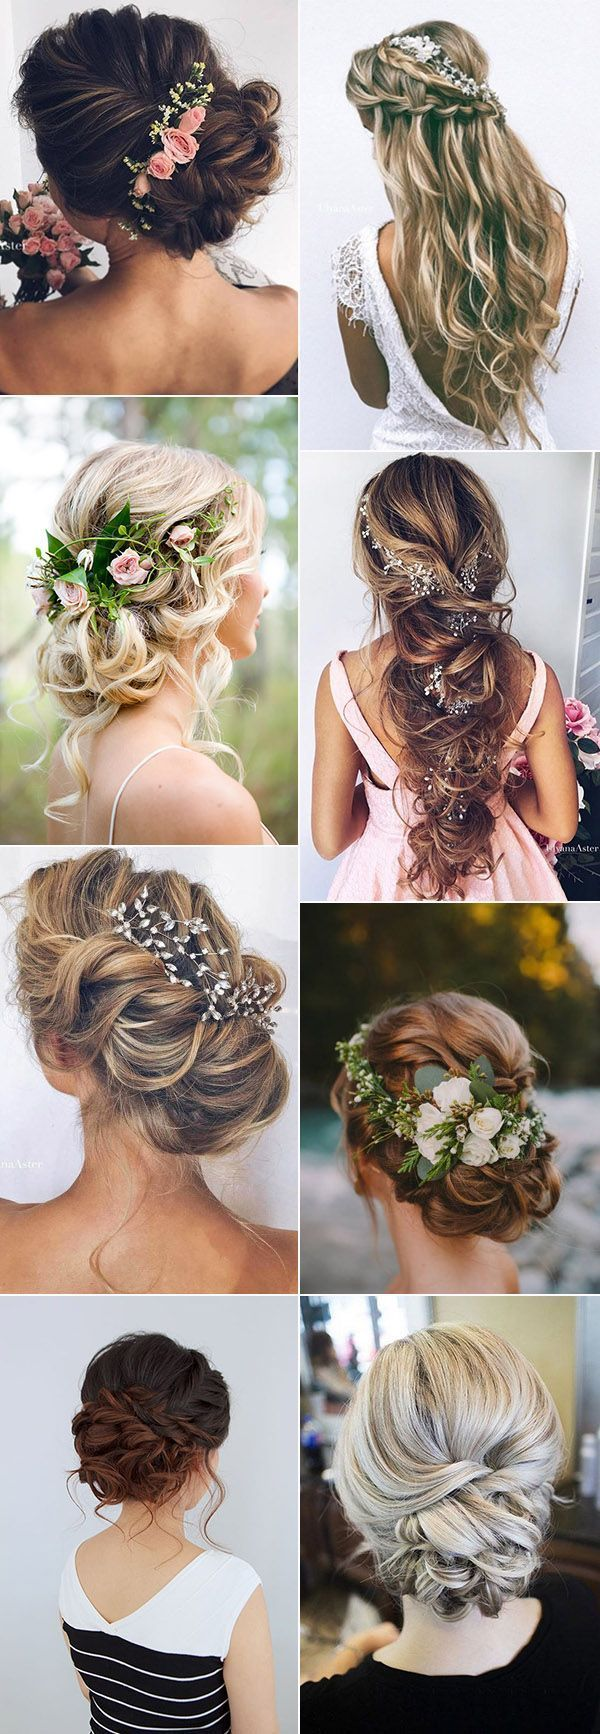 Makeup & Hair Ideas: top 20 wedding hairstyles ideas for 2017 trends… – María Ravetta